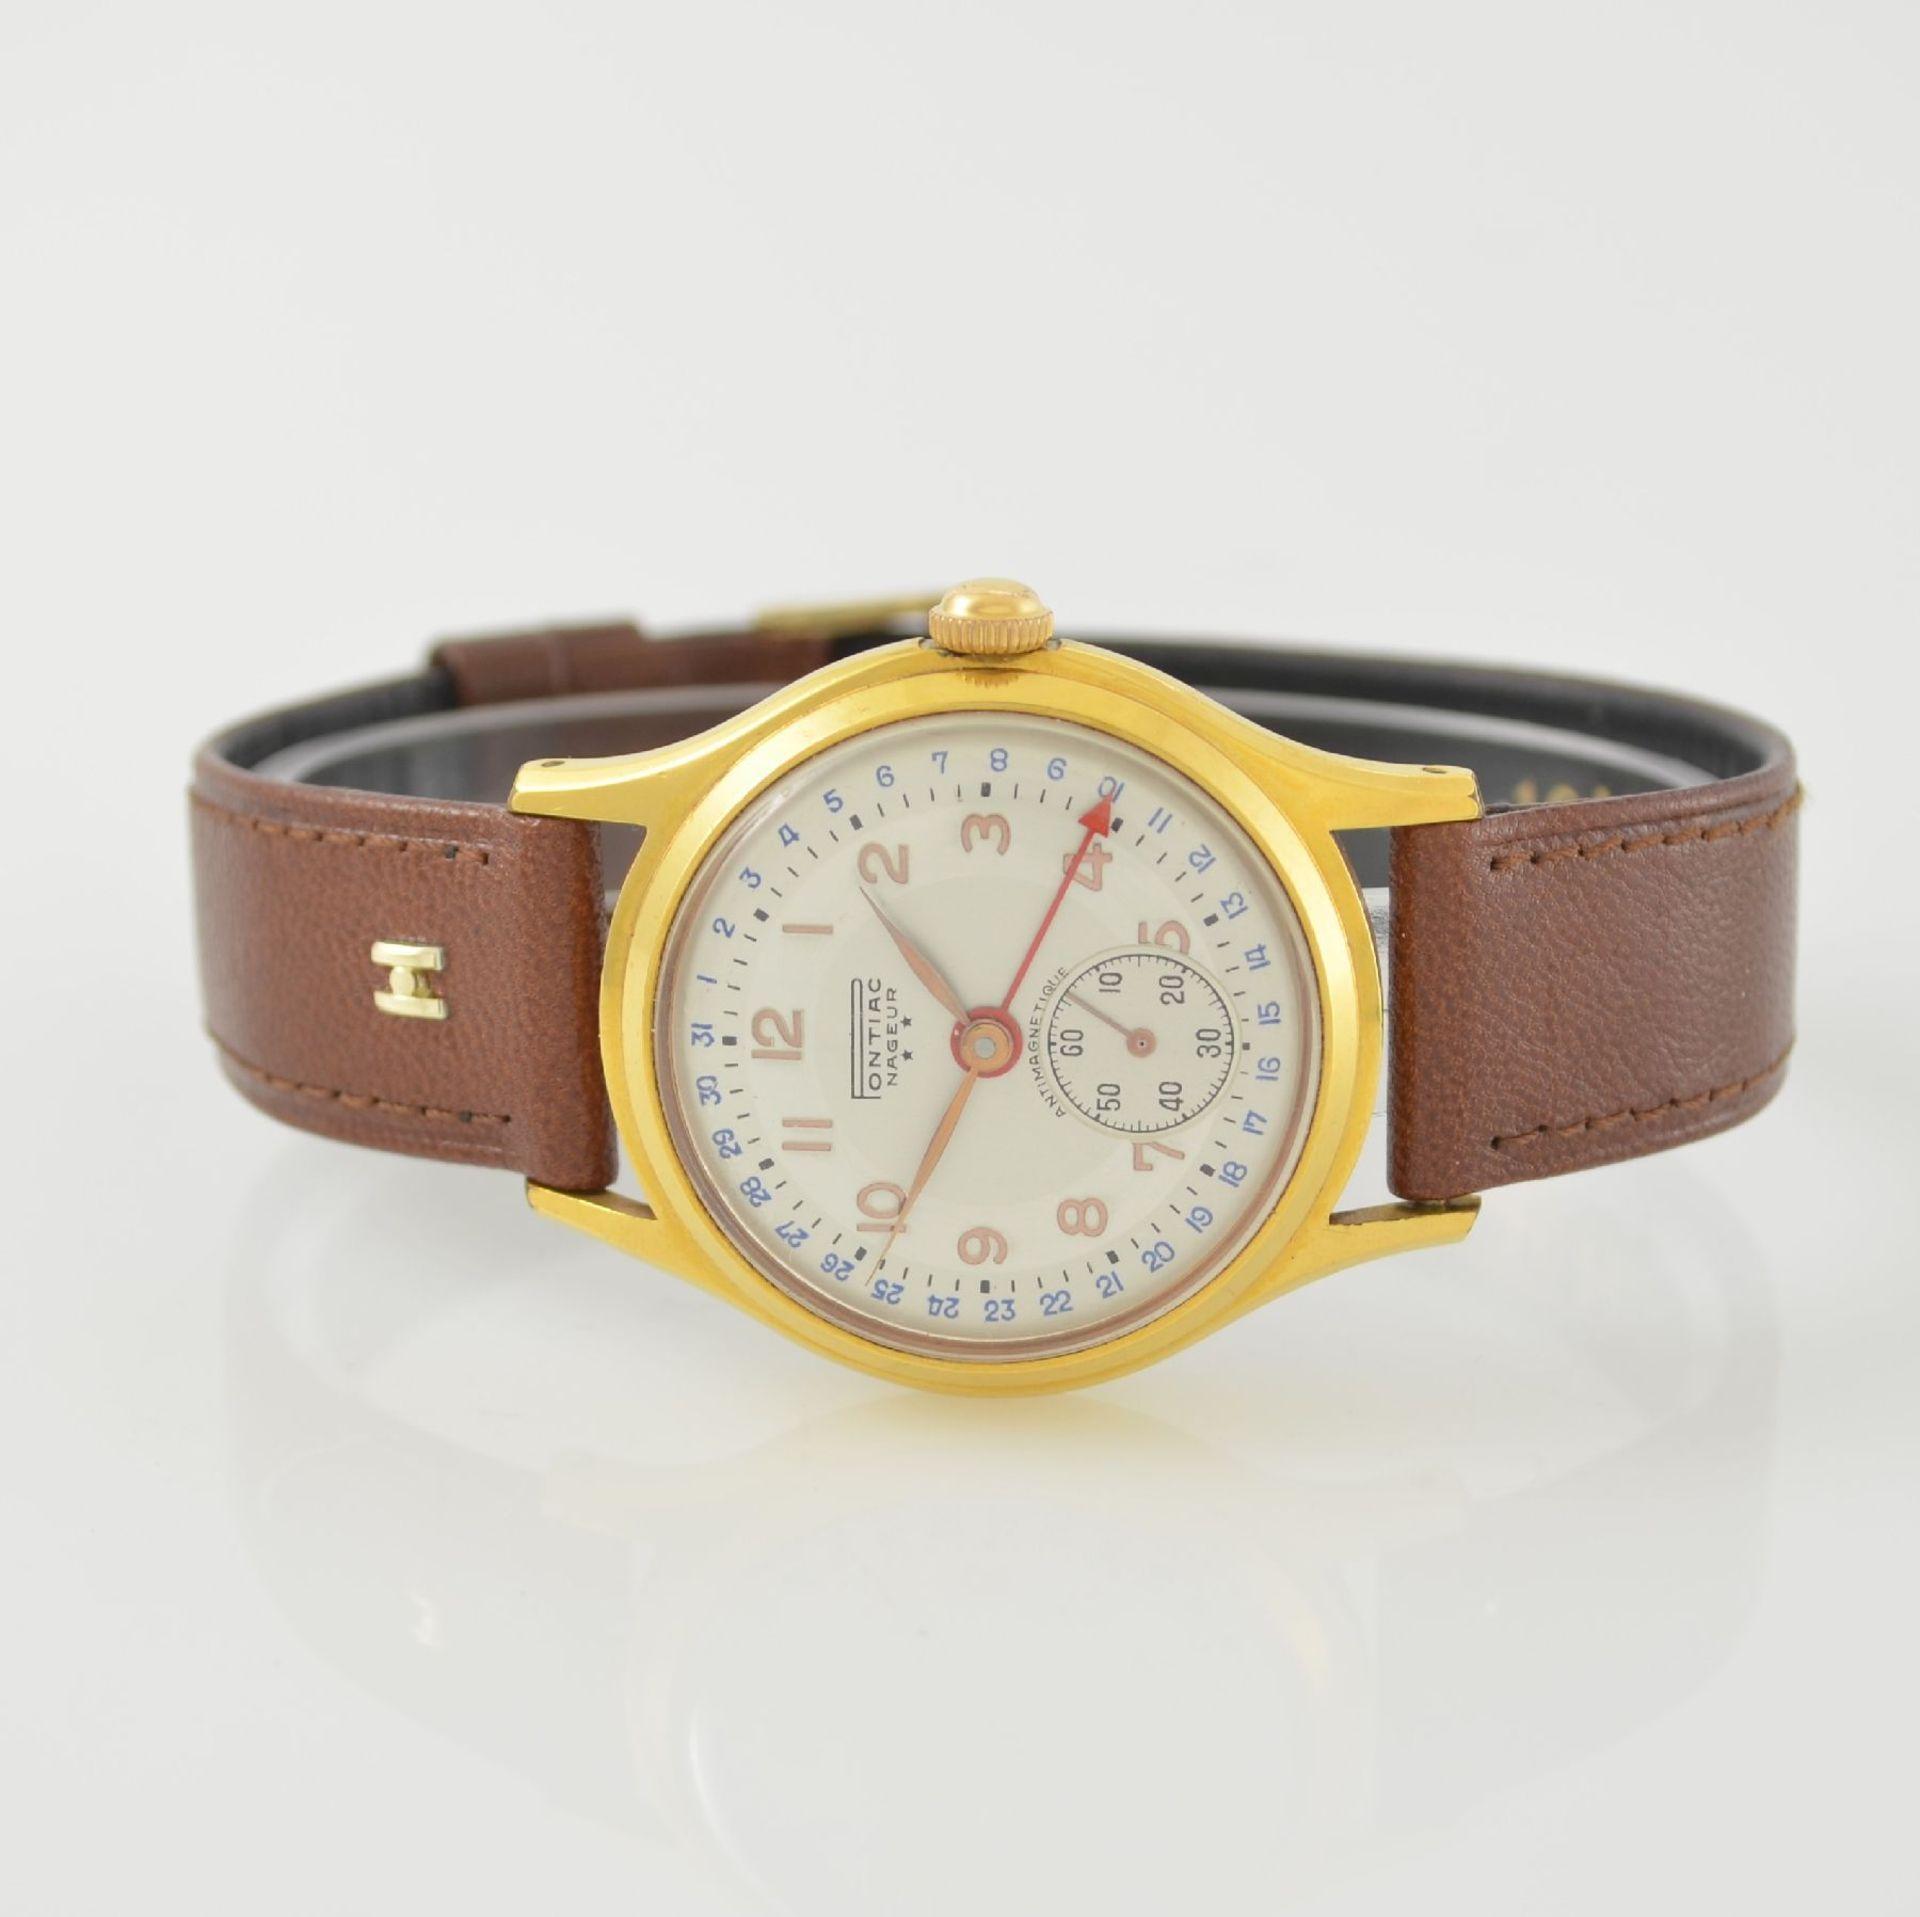 Konvolut: 2 Armbanduhren mit Kalender bzw. Datum, Schweiz um 1950-1960, Handaufzug, 1) NACAR m. - Bild 7 aus 12